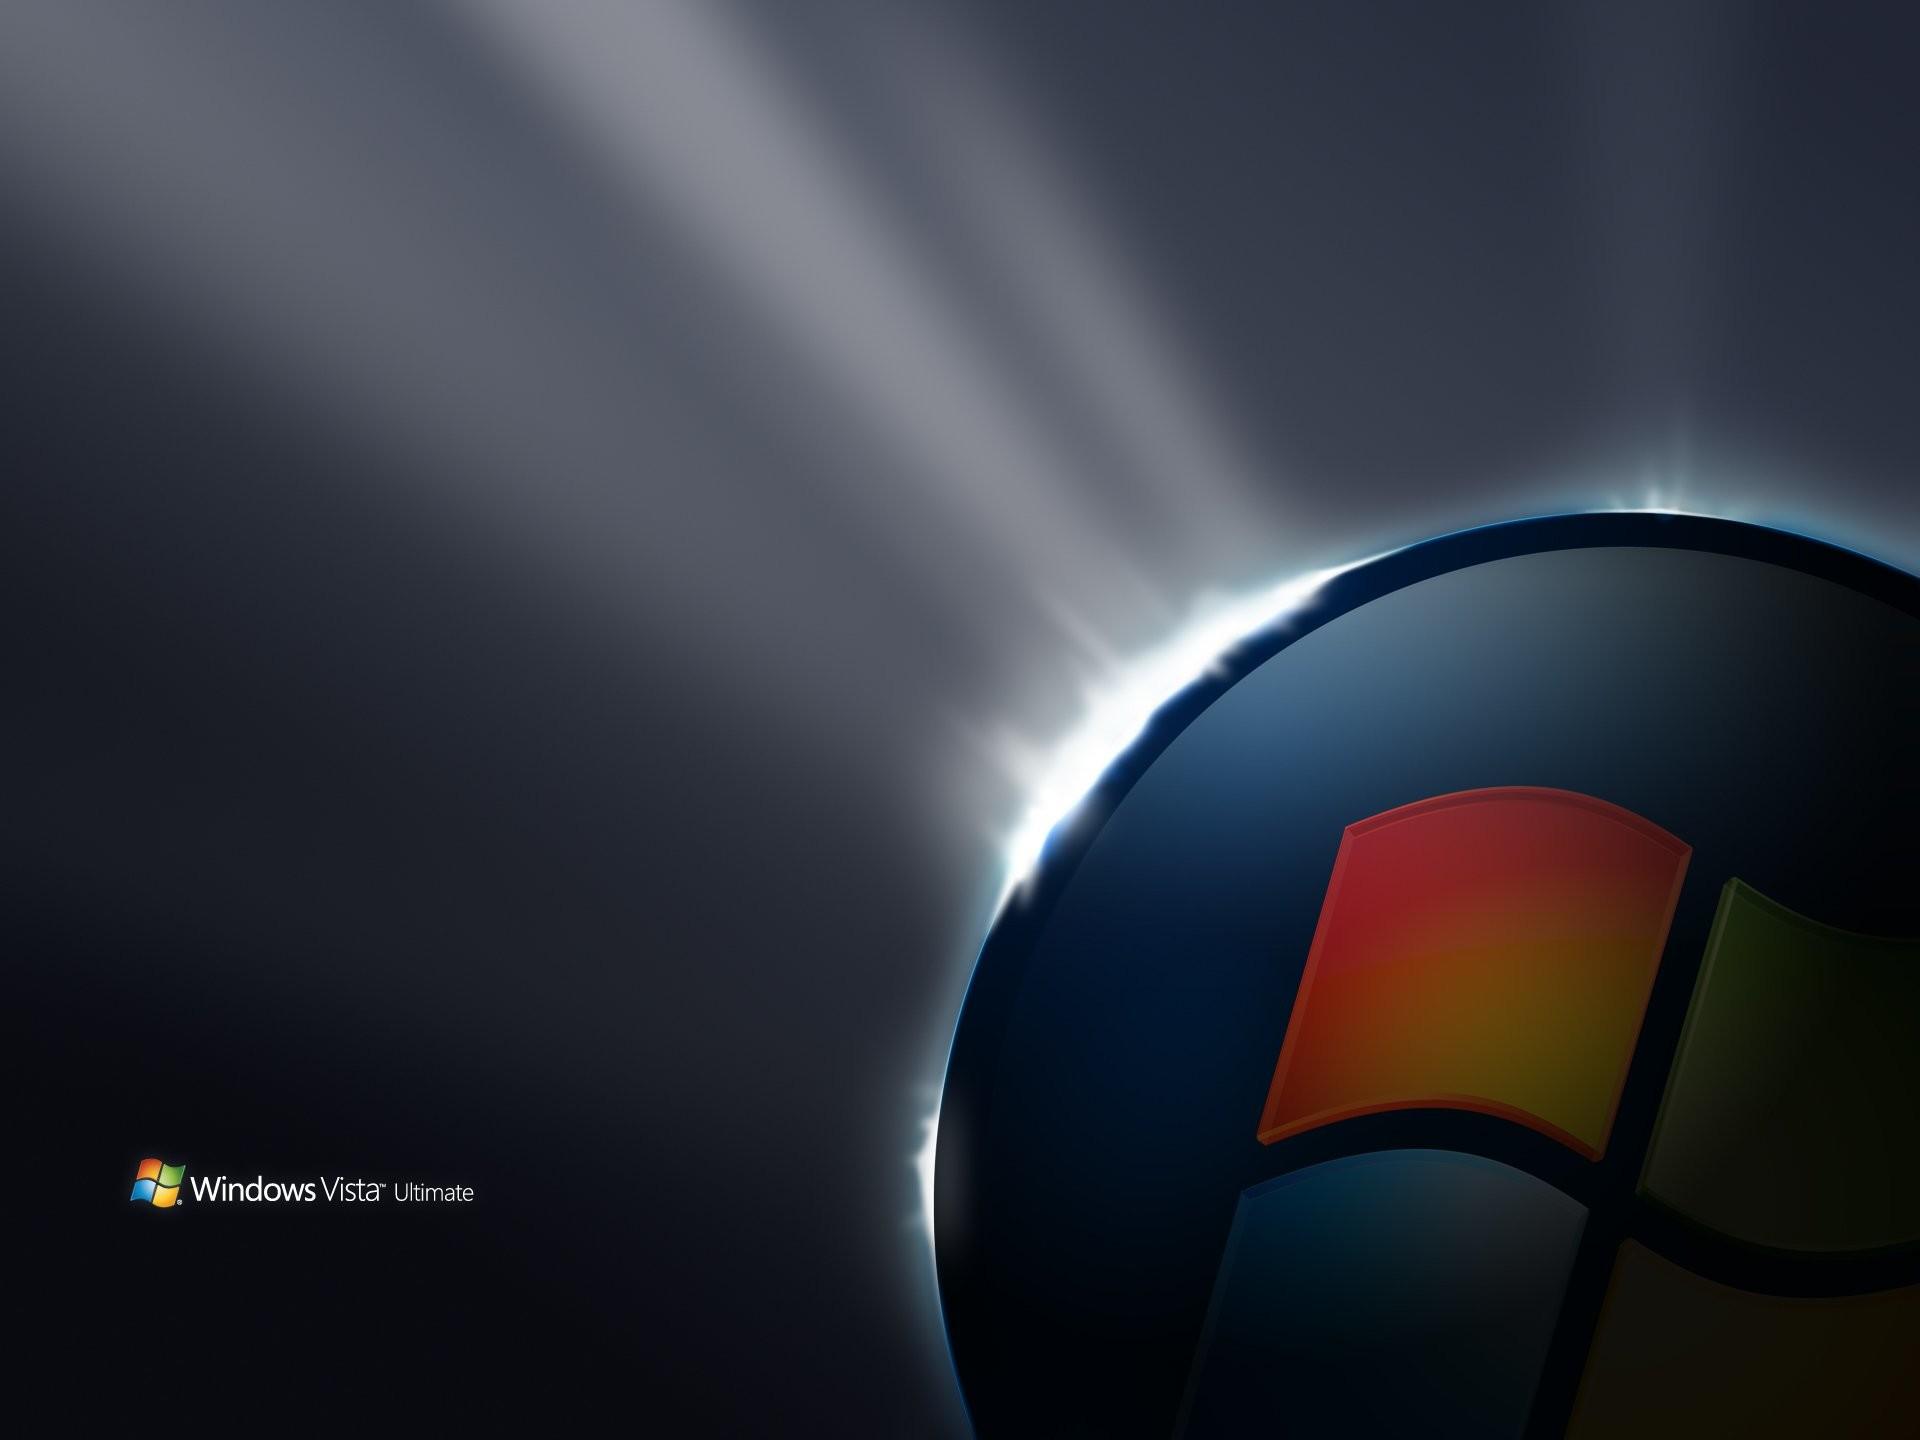 Res: 1920x1440, HD Wallpaper   Background Image ID:41172.  Technology Windows Vista